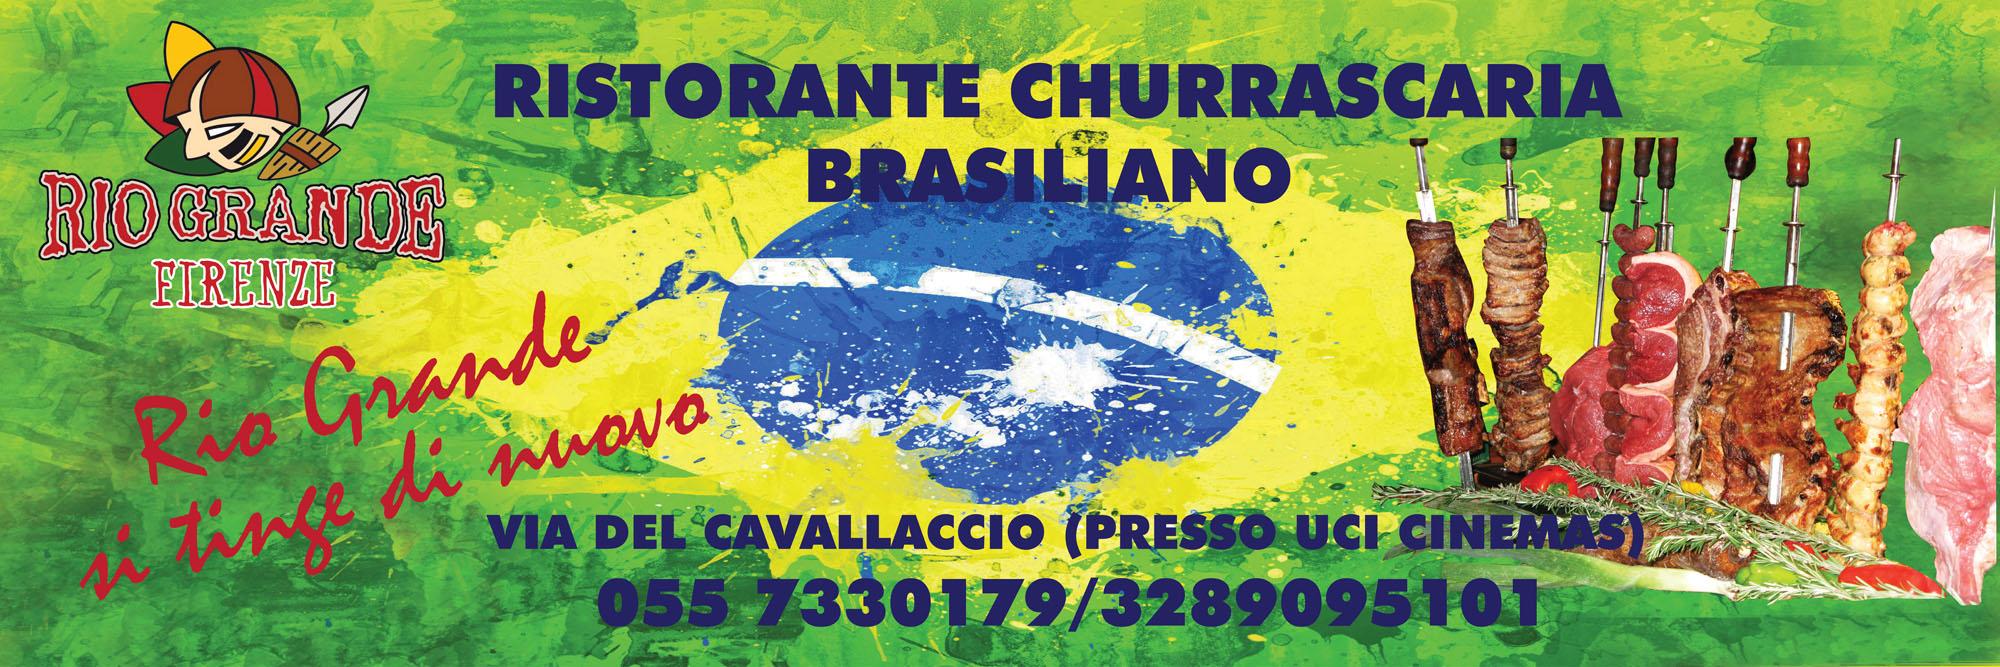 Ristorante Brasiliano Firenze